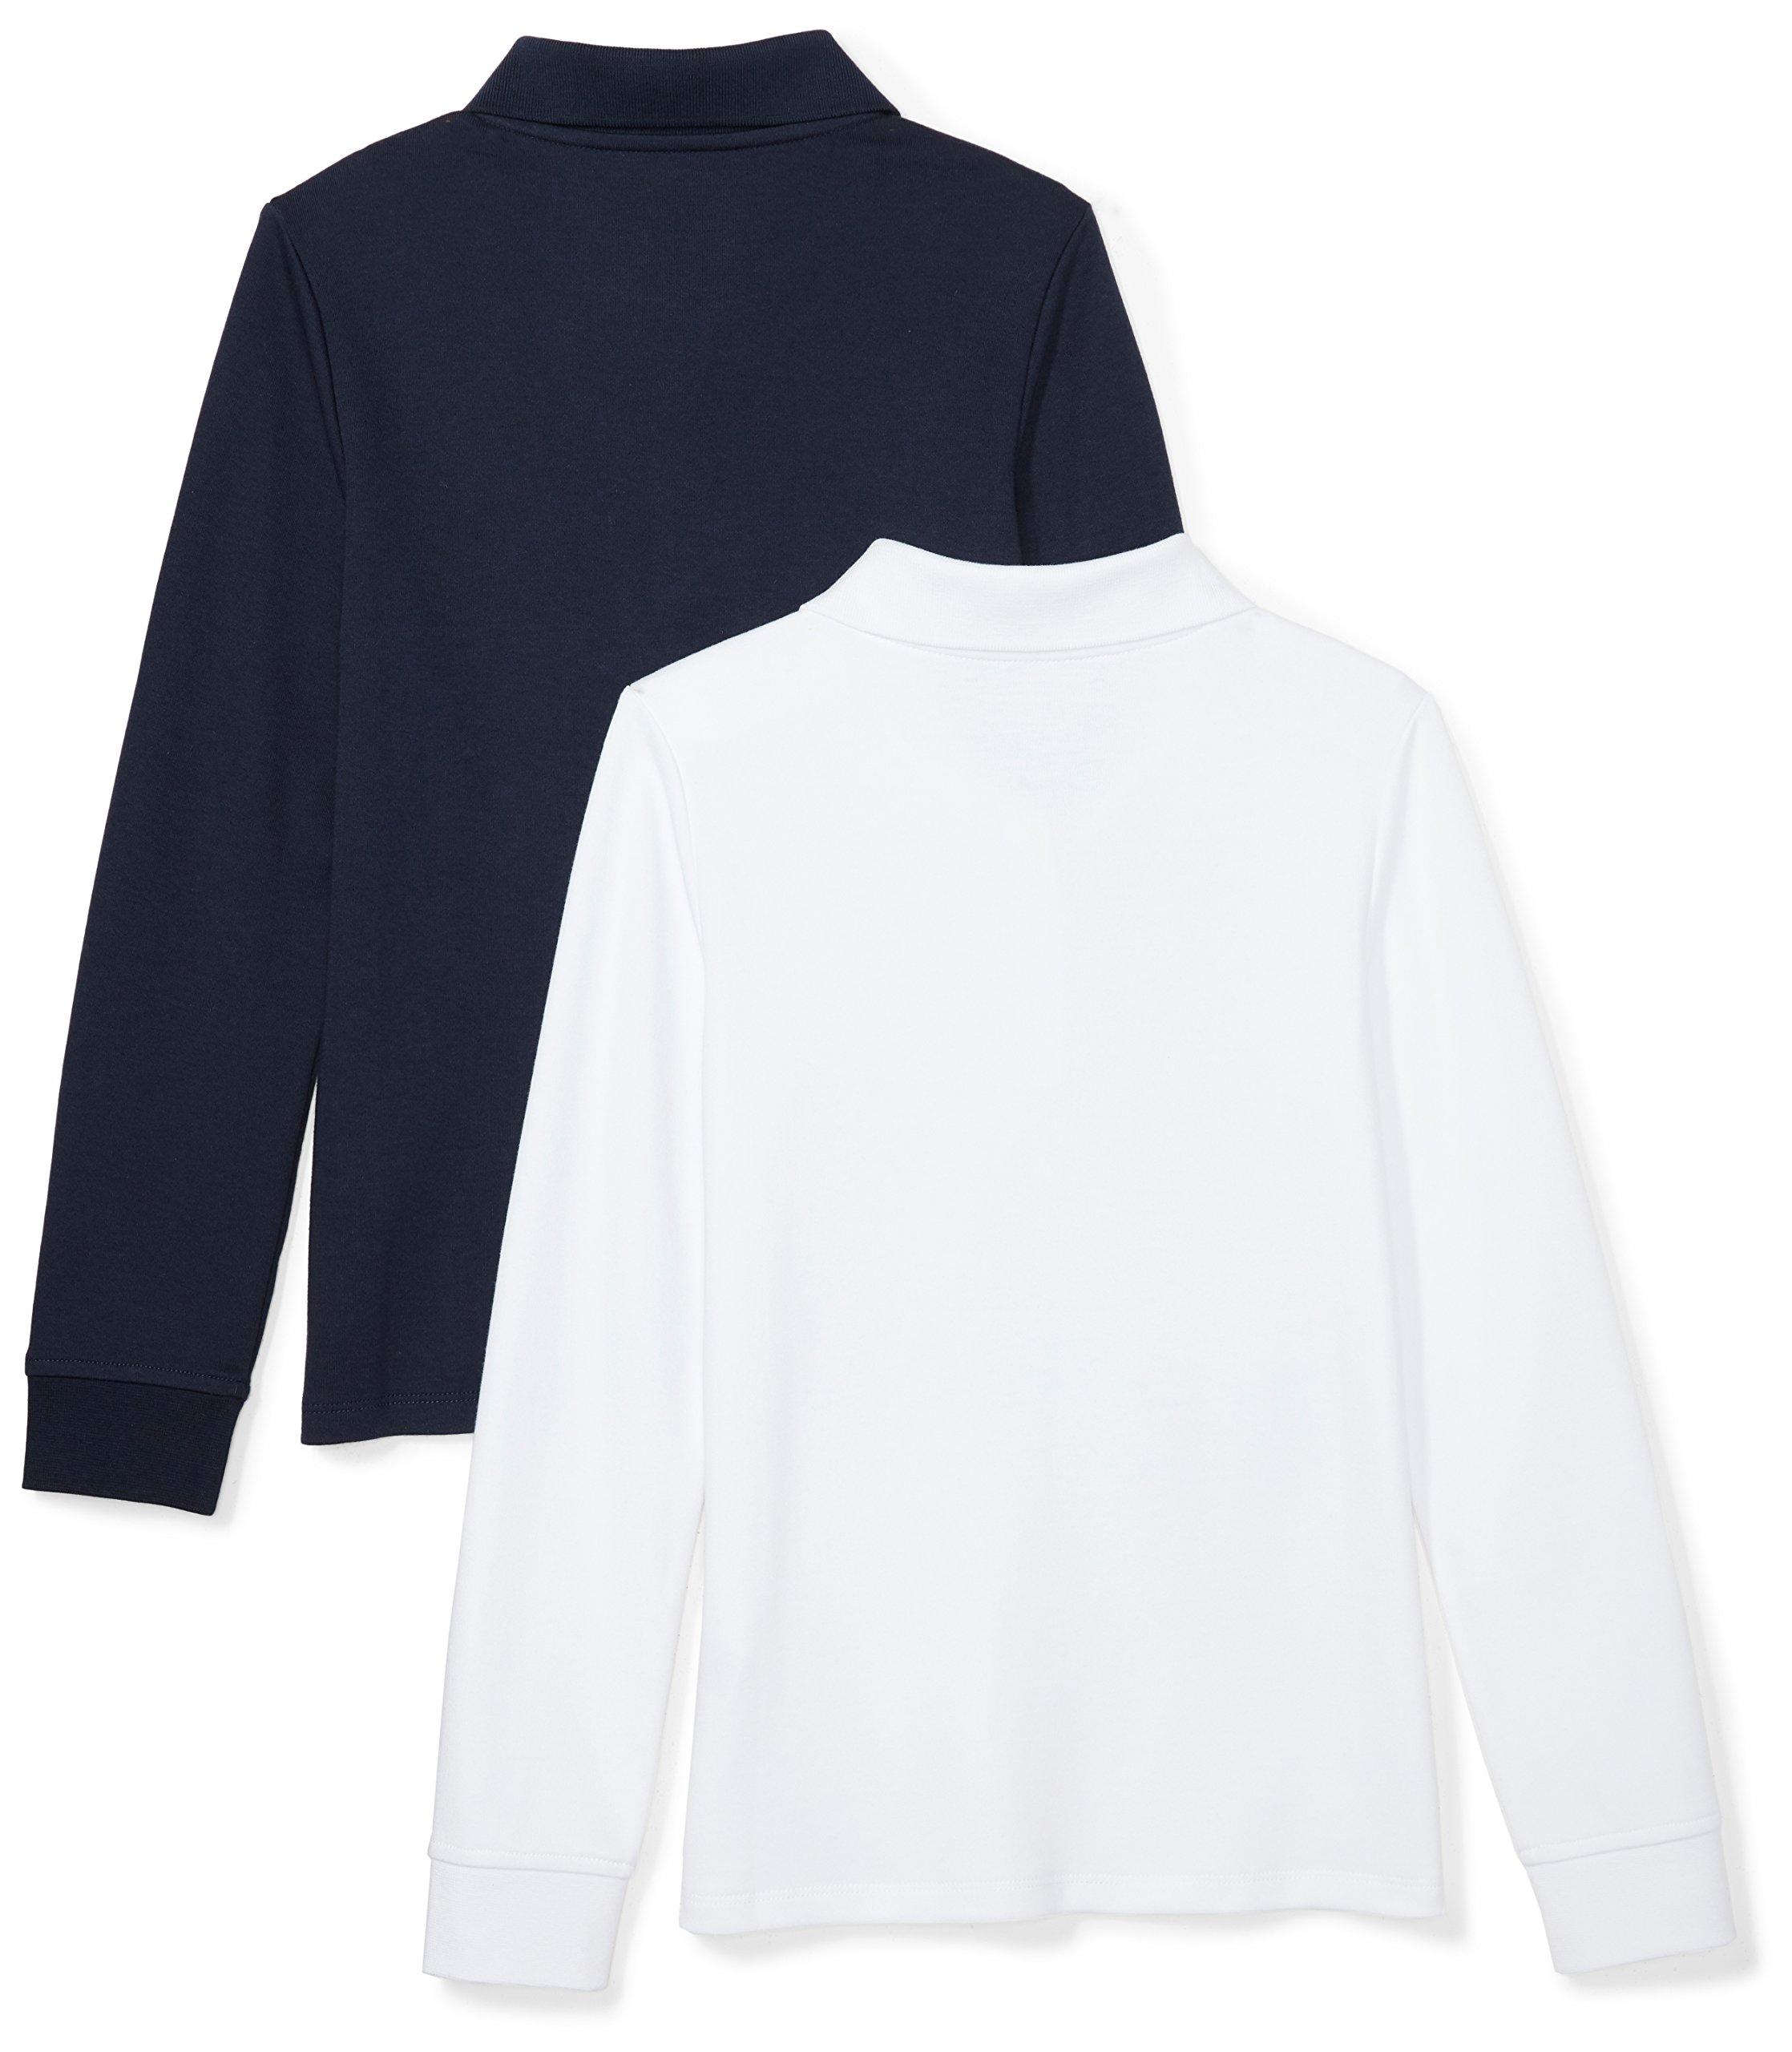 Amazon Essentials Girls' 2-Pack Long-Sleeve Interlock Polo Shirt, Navy/White, XS (4-5) by Amazon Essentials (Image #2)